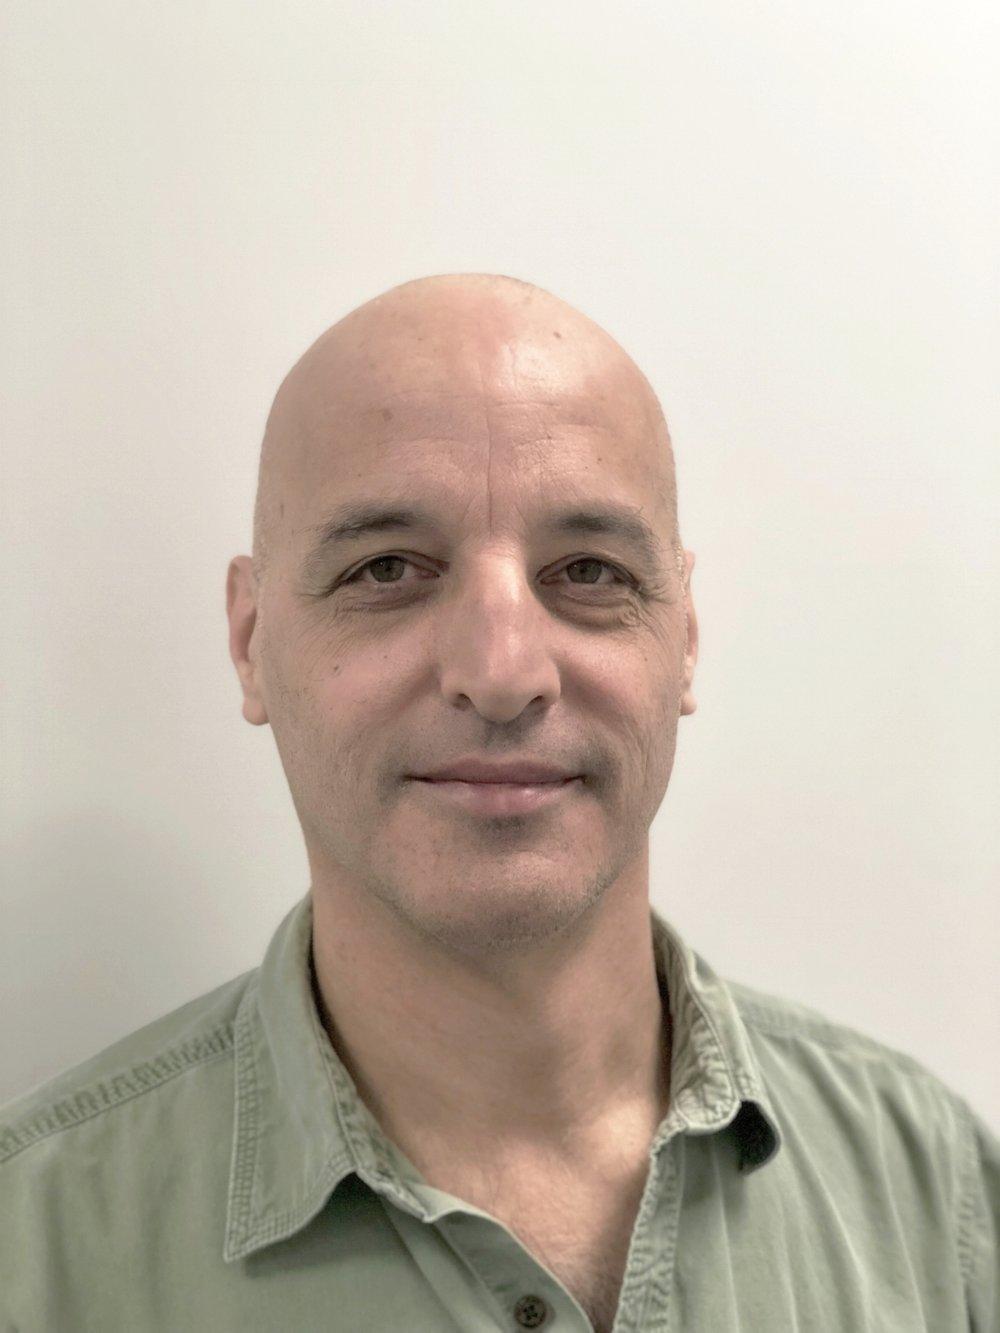 Toni Osteopathic Practitioner Athletic Therapist